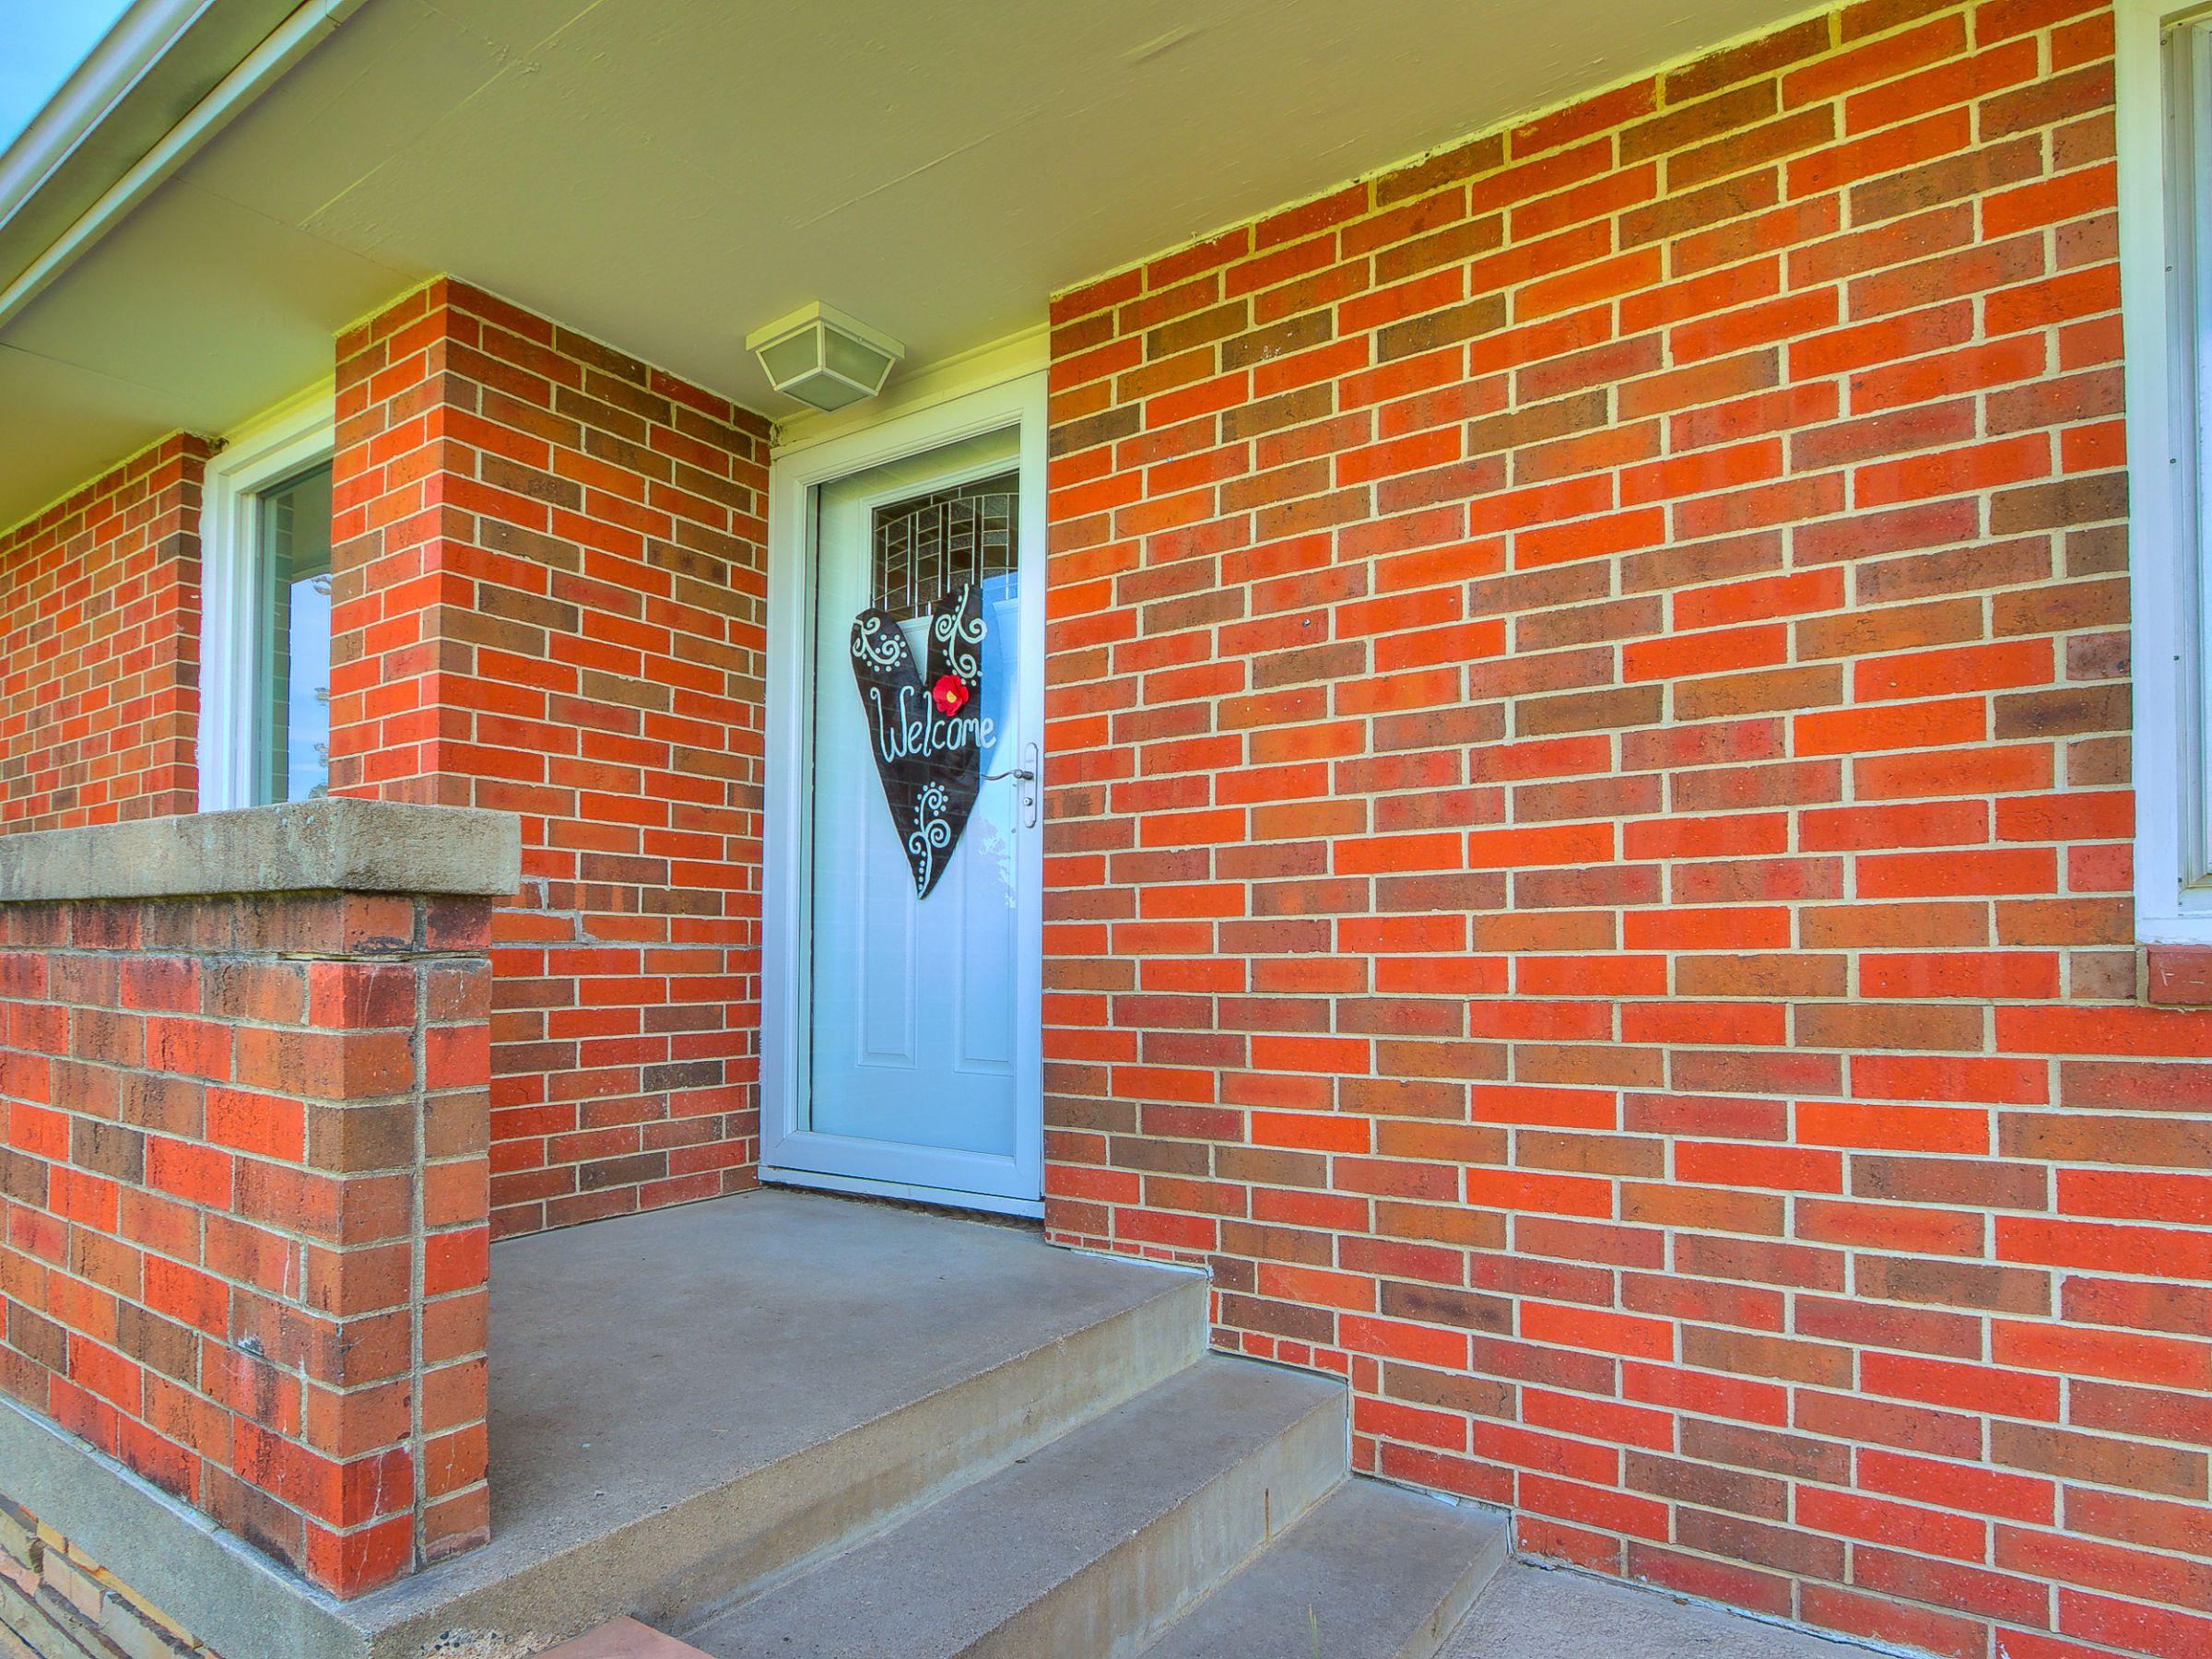 residential-warren-county-iowa-3-acres-listing-number-15516-0-2021-05-12-144632.jpg